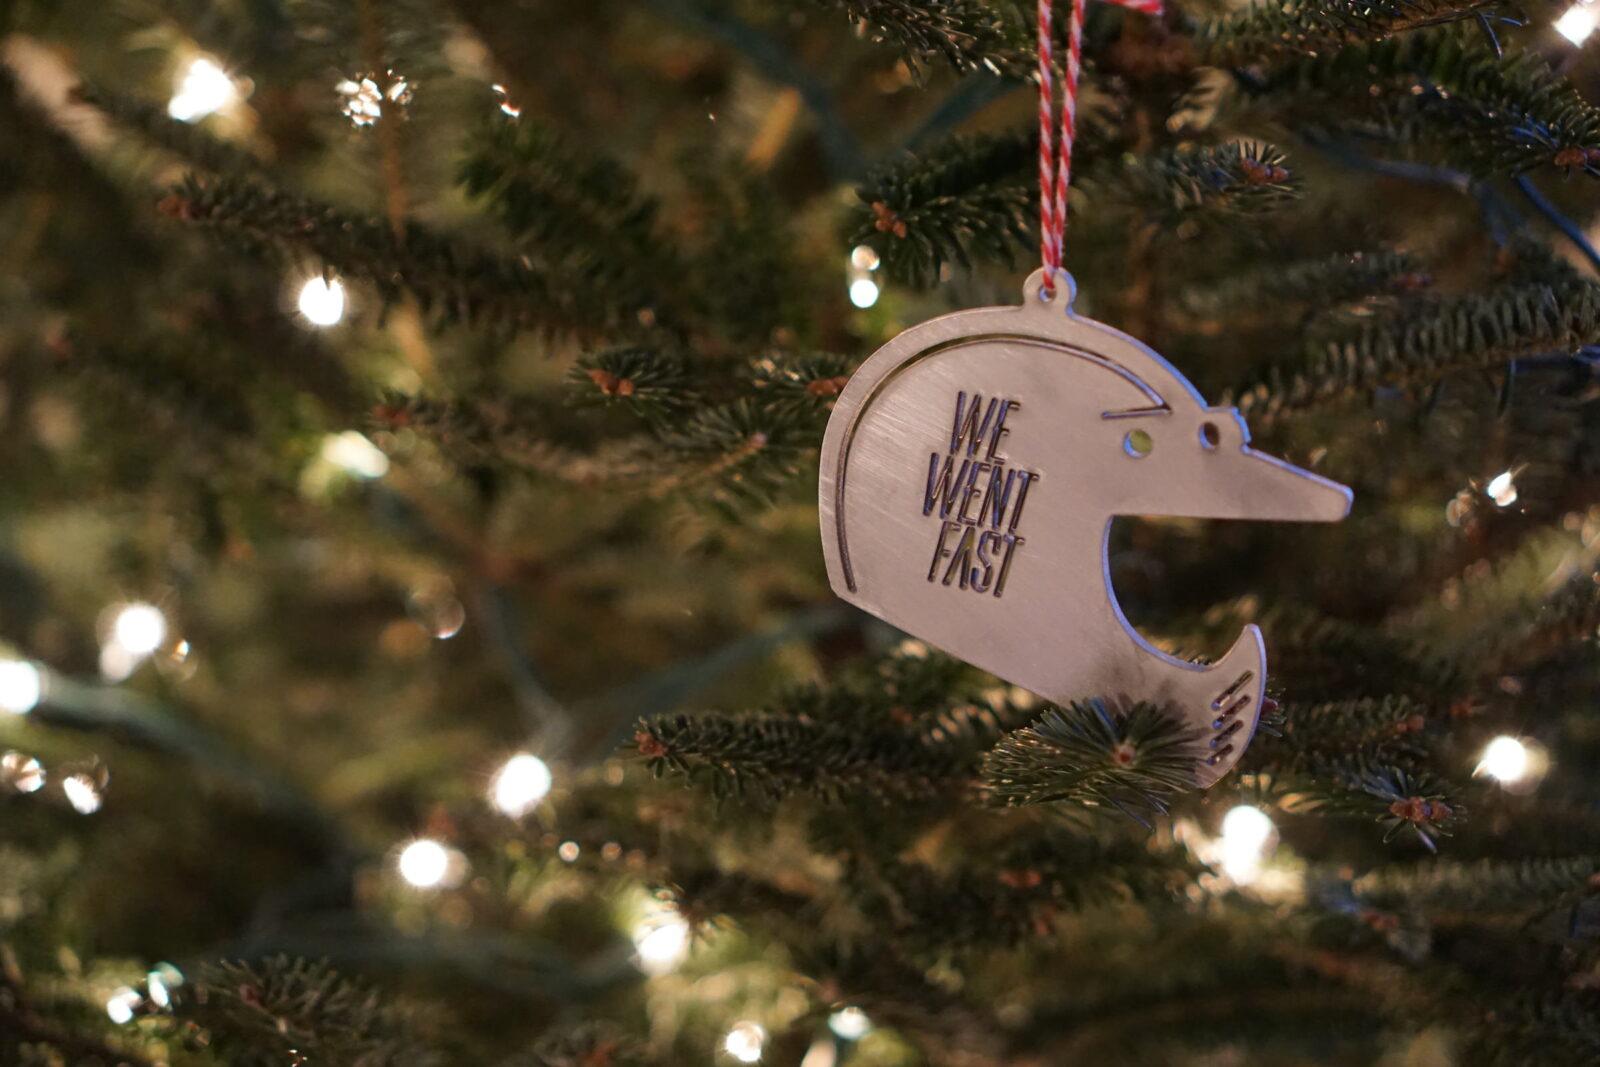 We Went Fast Helmet Bottler Opener Ornament 1600x1067 - We Went Fast - Helmet Christmas Tree Ornament + Bottler Opener